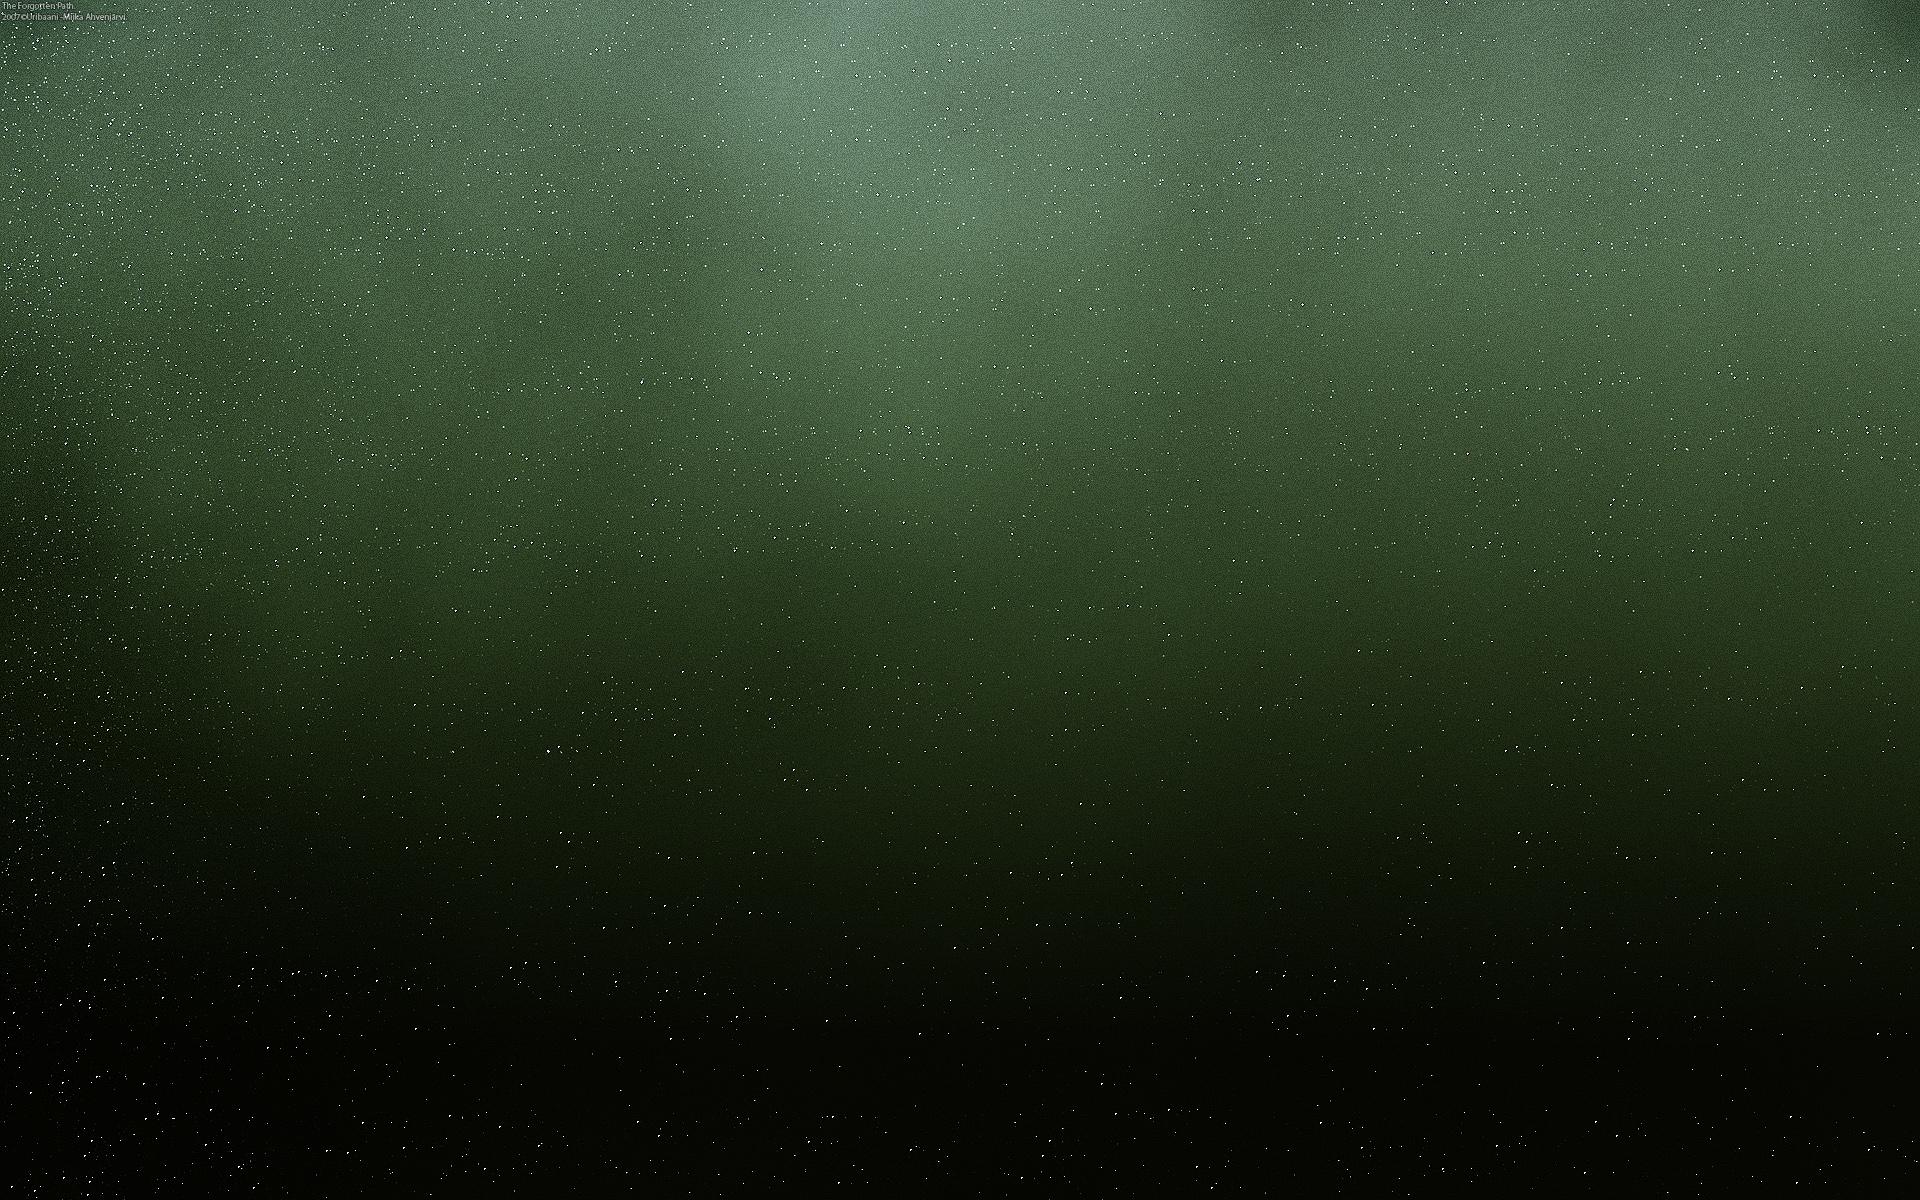 Abstract wallpaper   548399 1920x1200